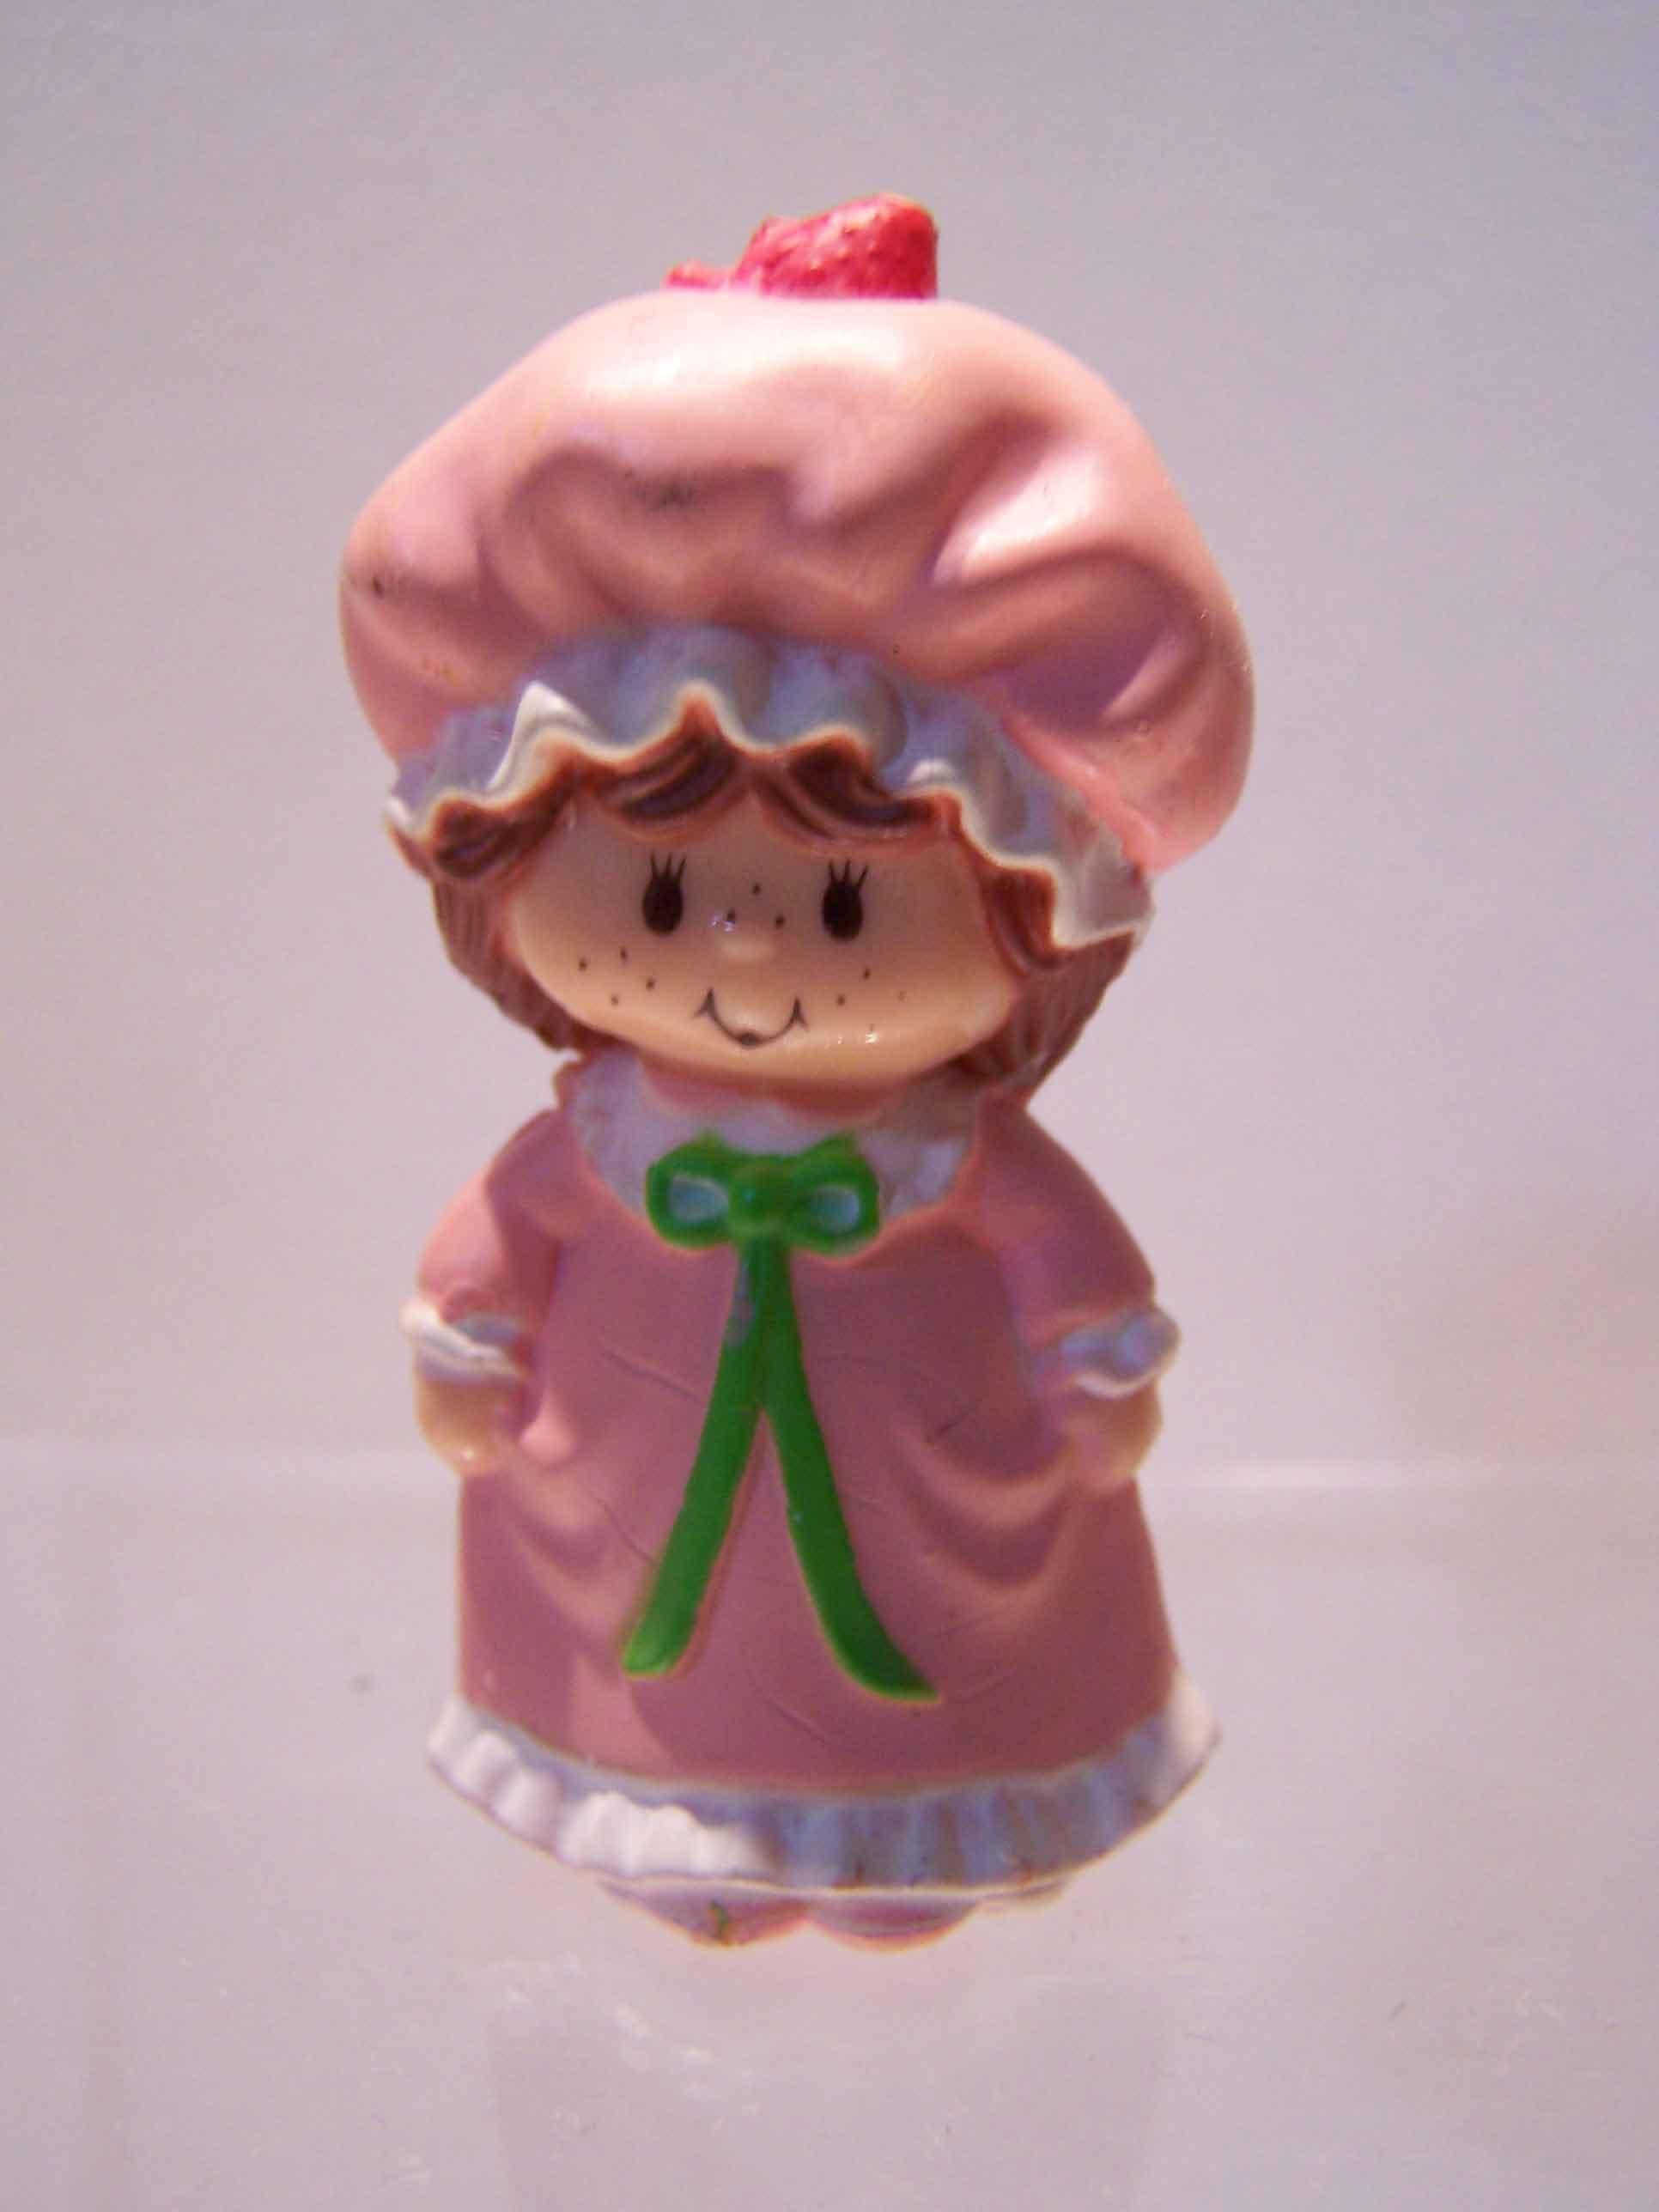 Amazoncom: vintage strawberry shortcake toys: Toys